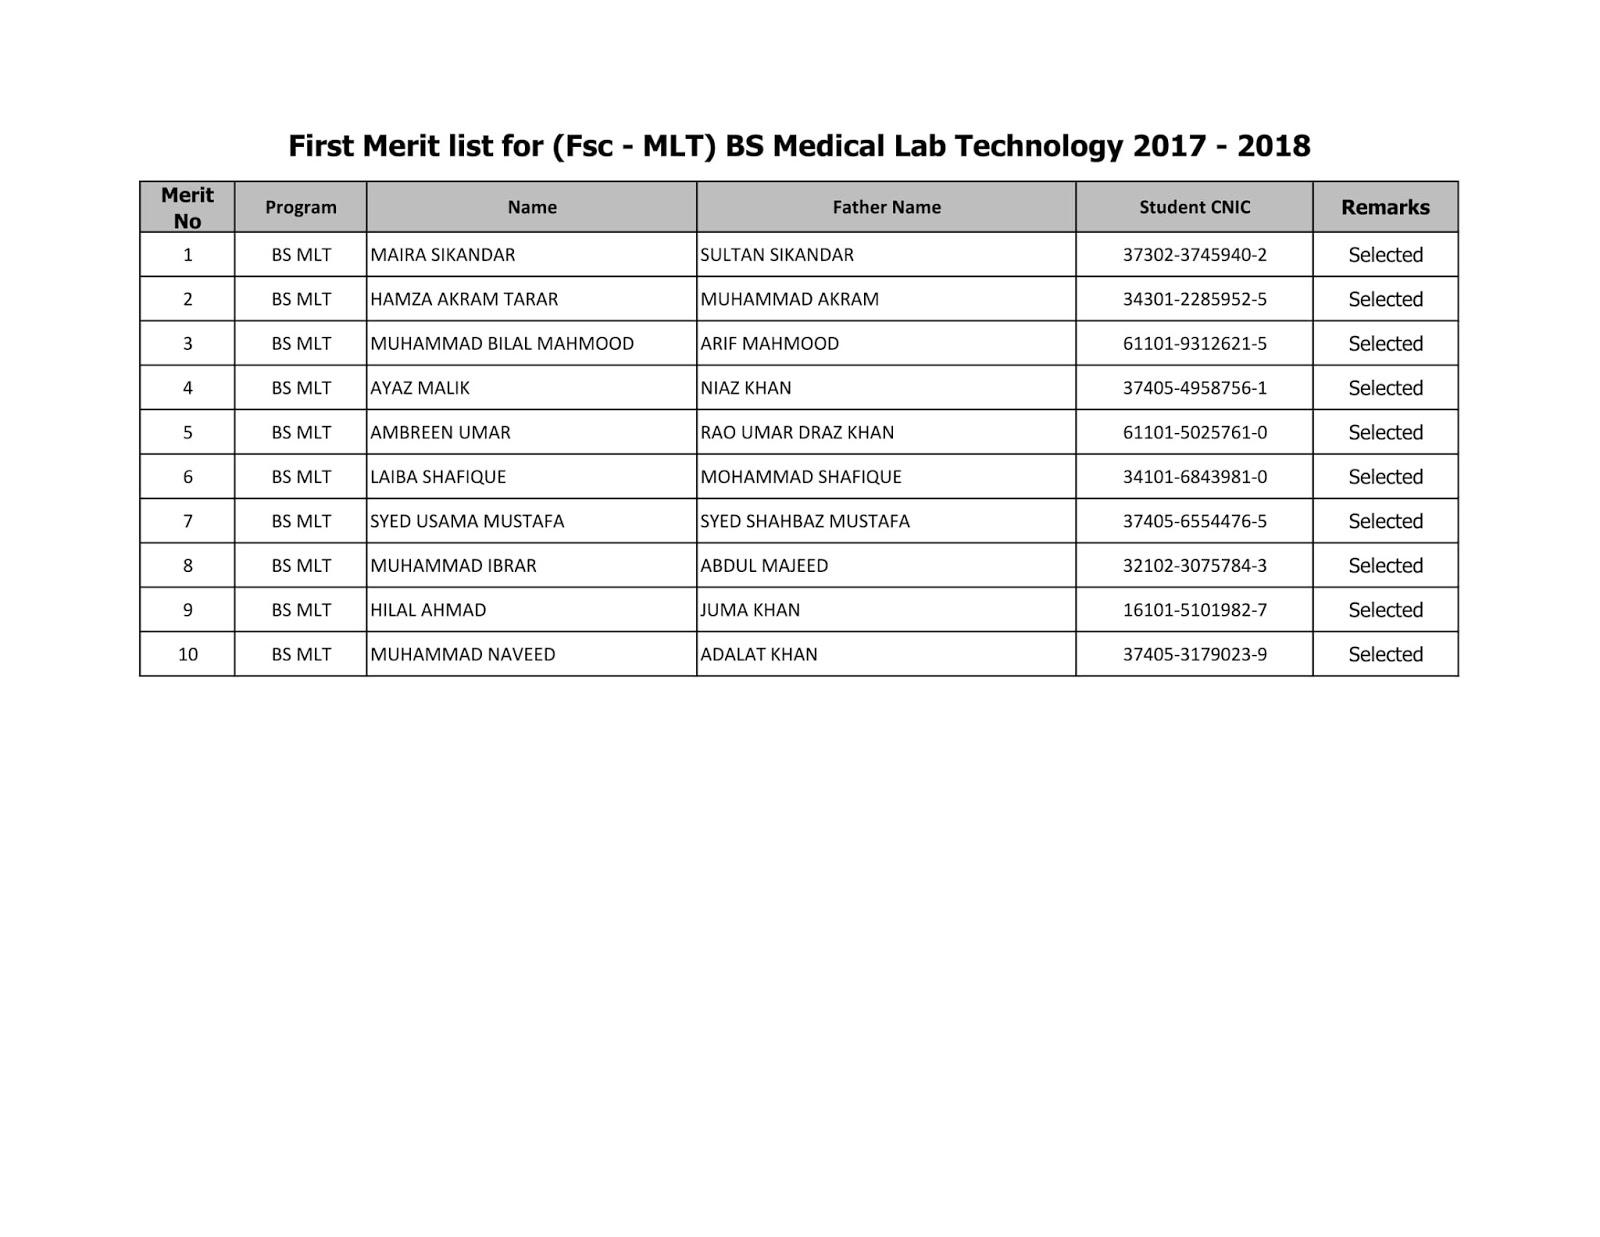 NUMS Merit List 2018(MLT & Cardiac Perfusion) | MDCAT Guide